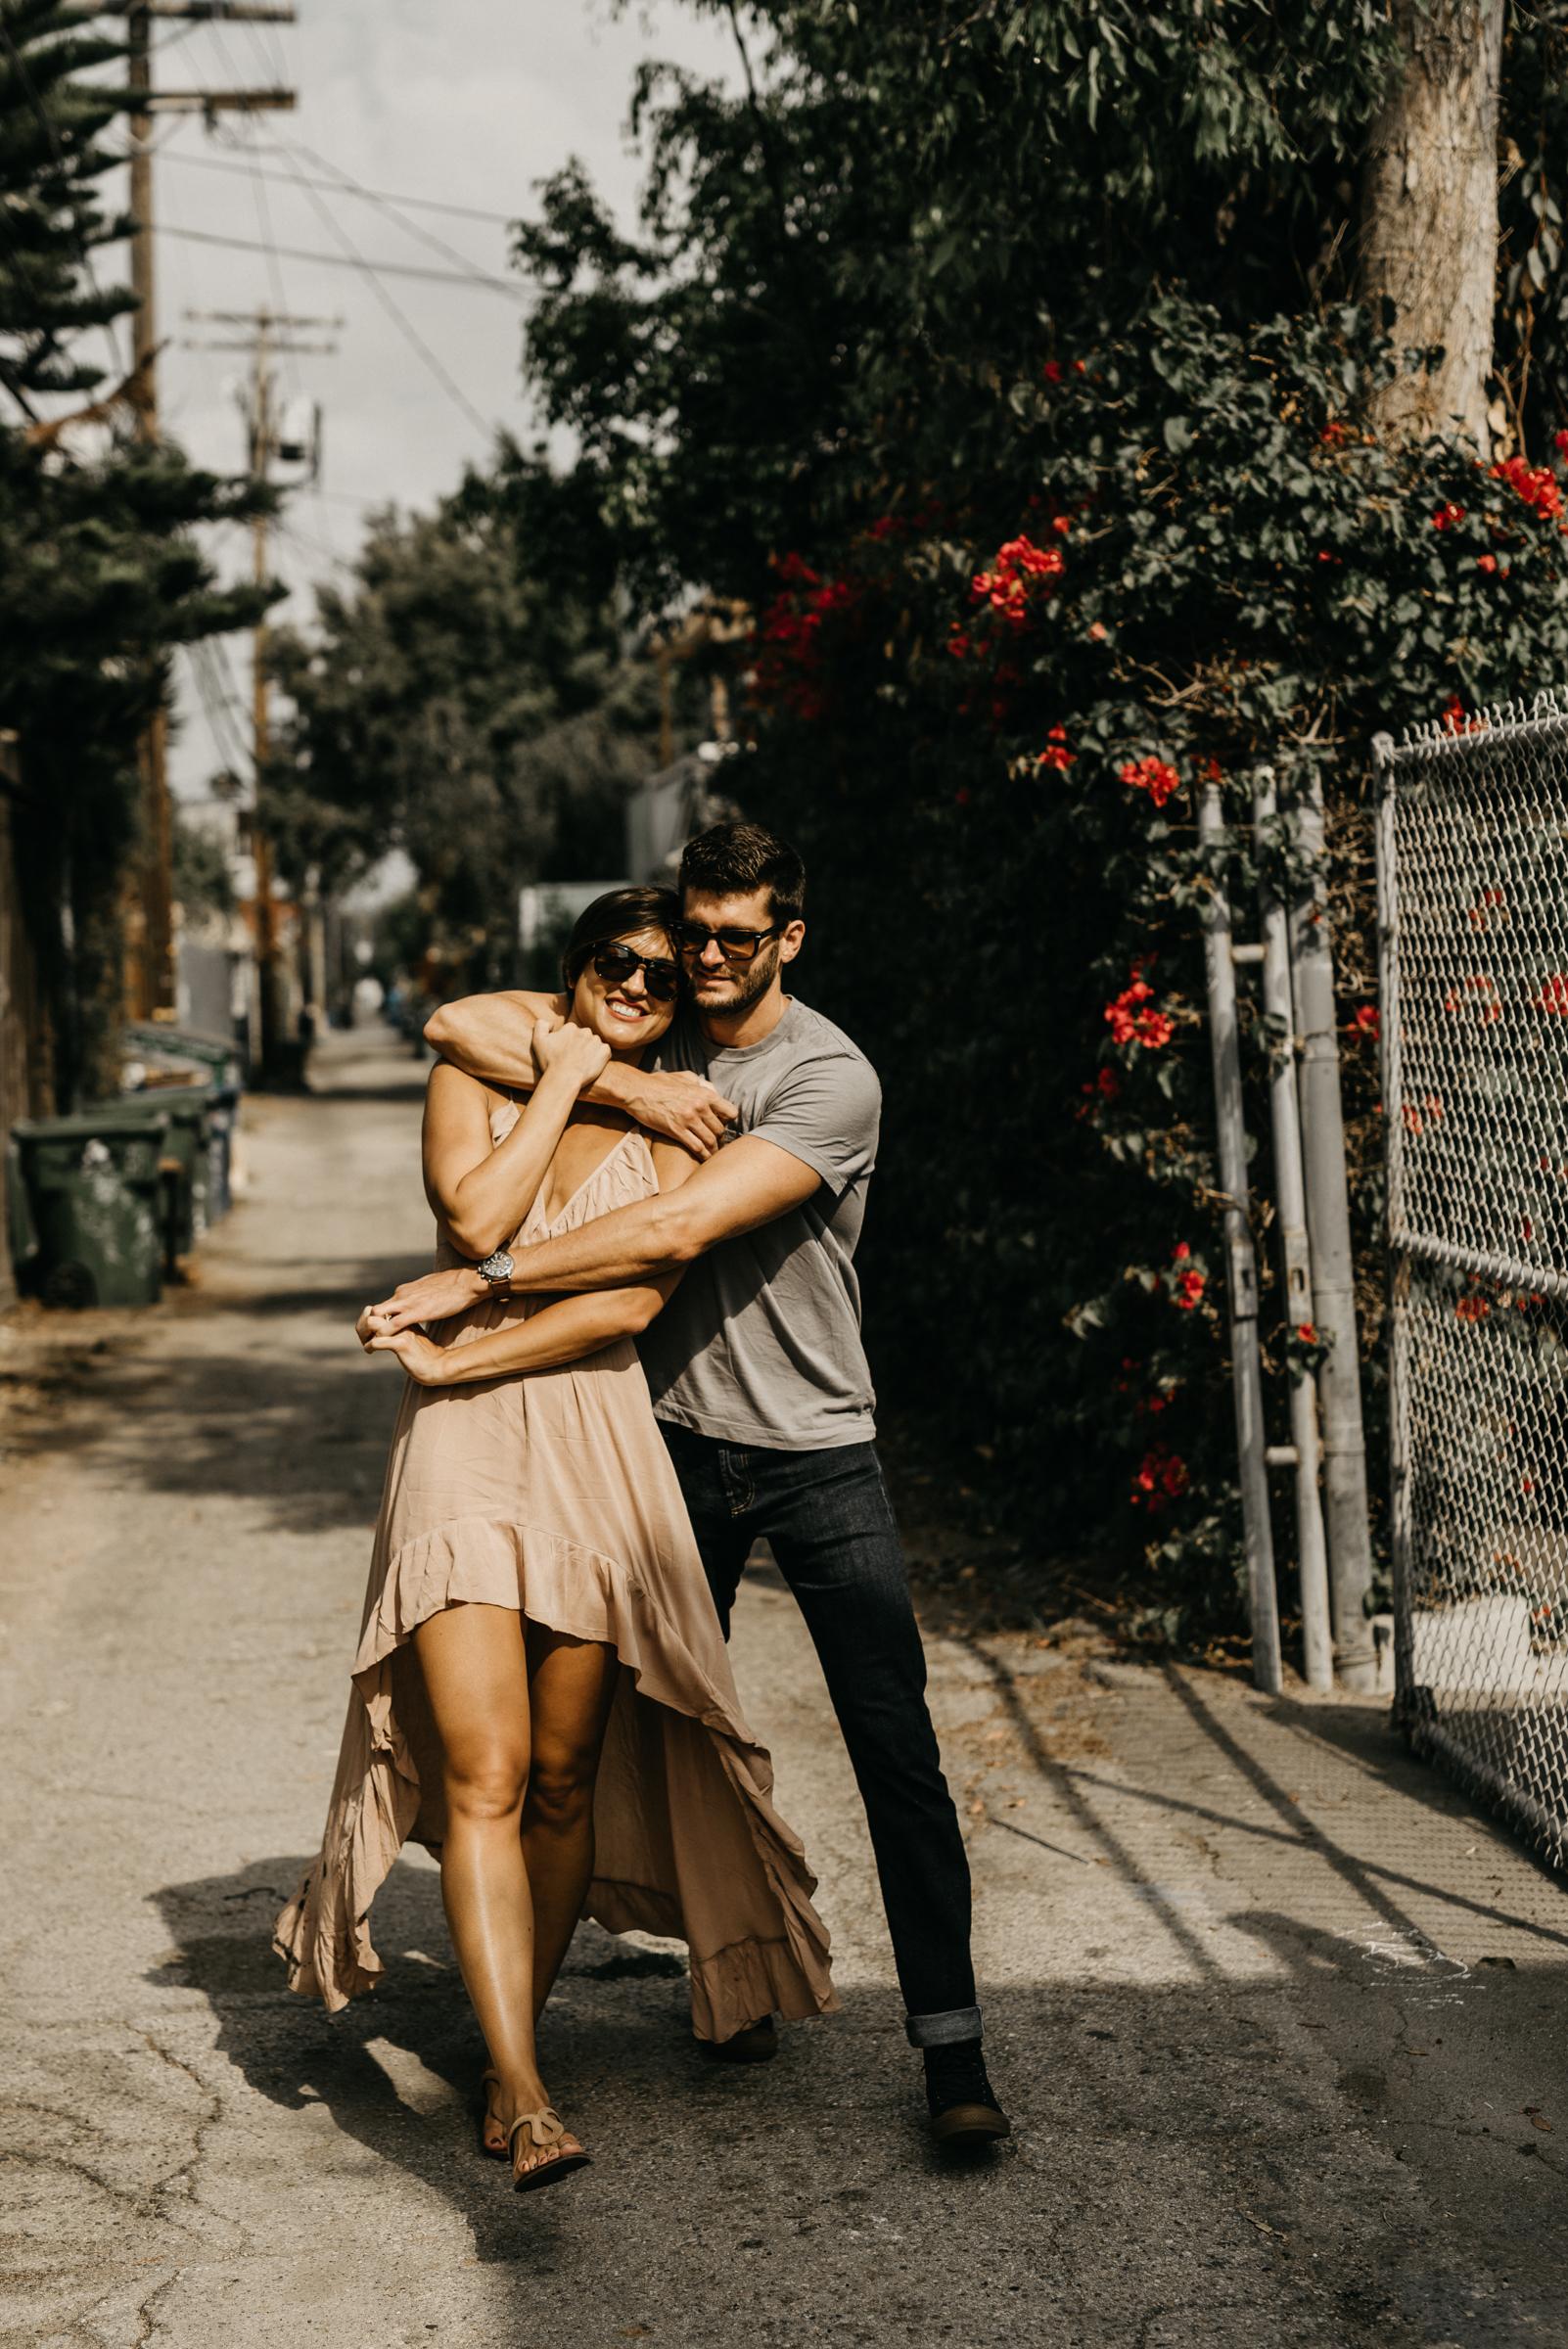 Isaiah + Taylor Photography - Venice Beach & Santa Monica Engagement Session, Los Angeles Wedding Photographer-038.jpg